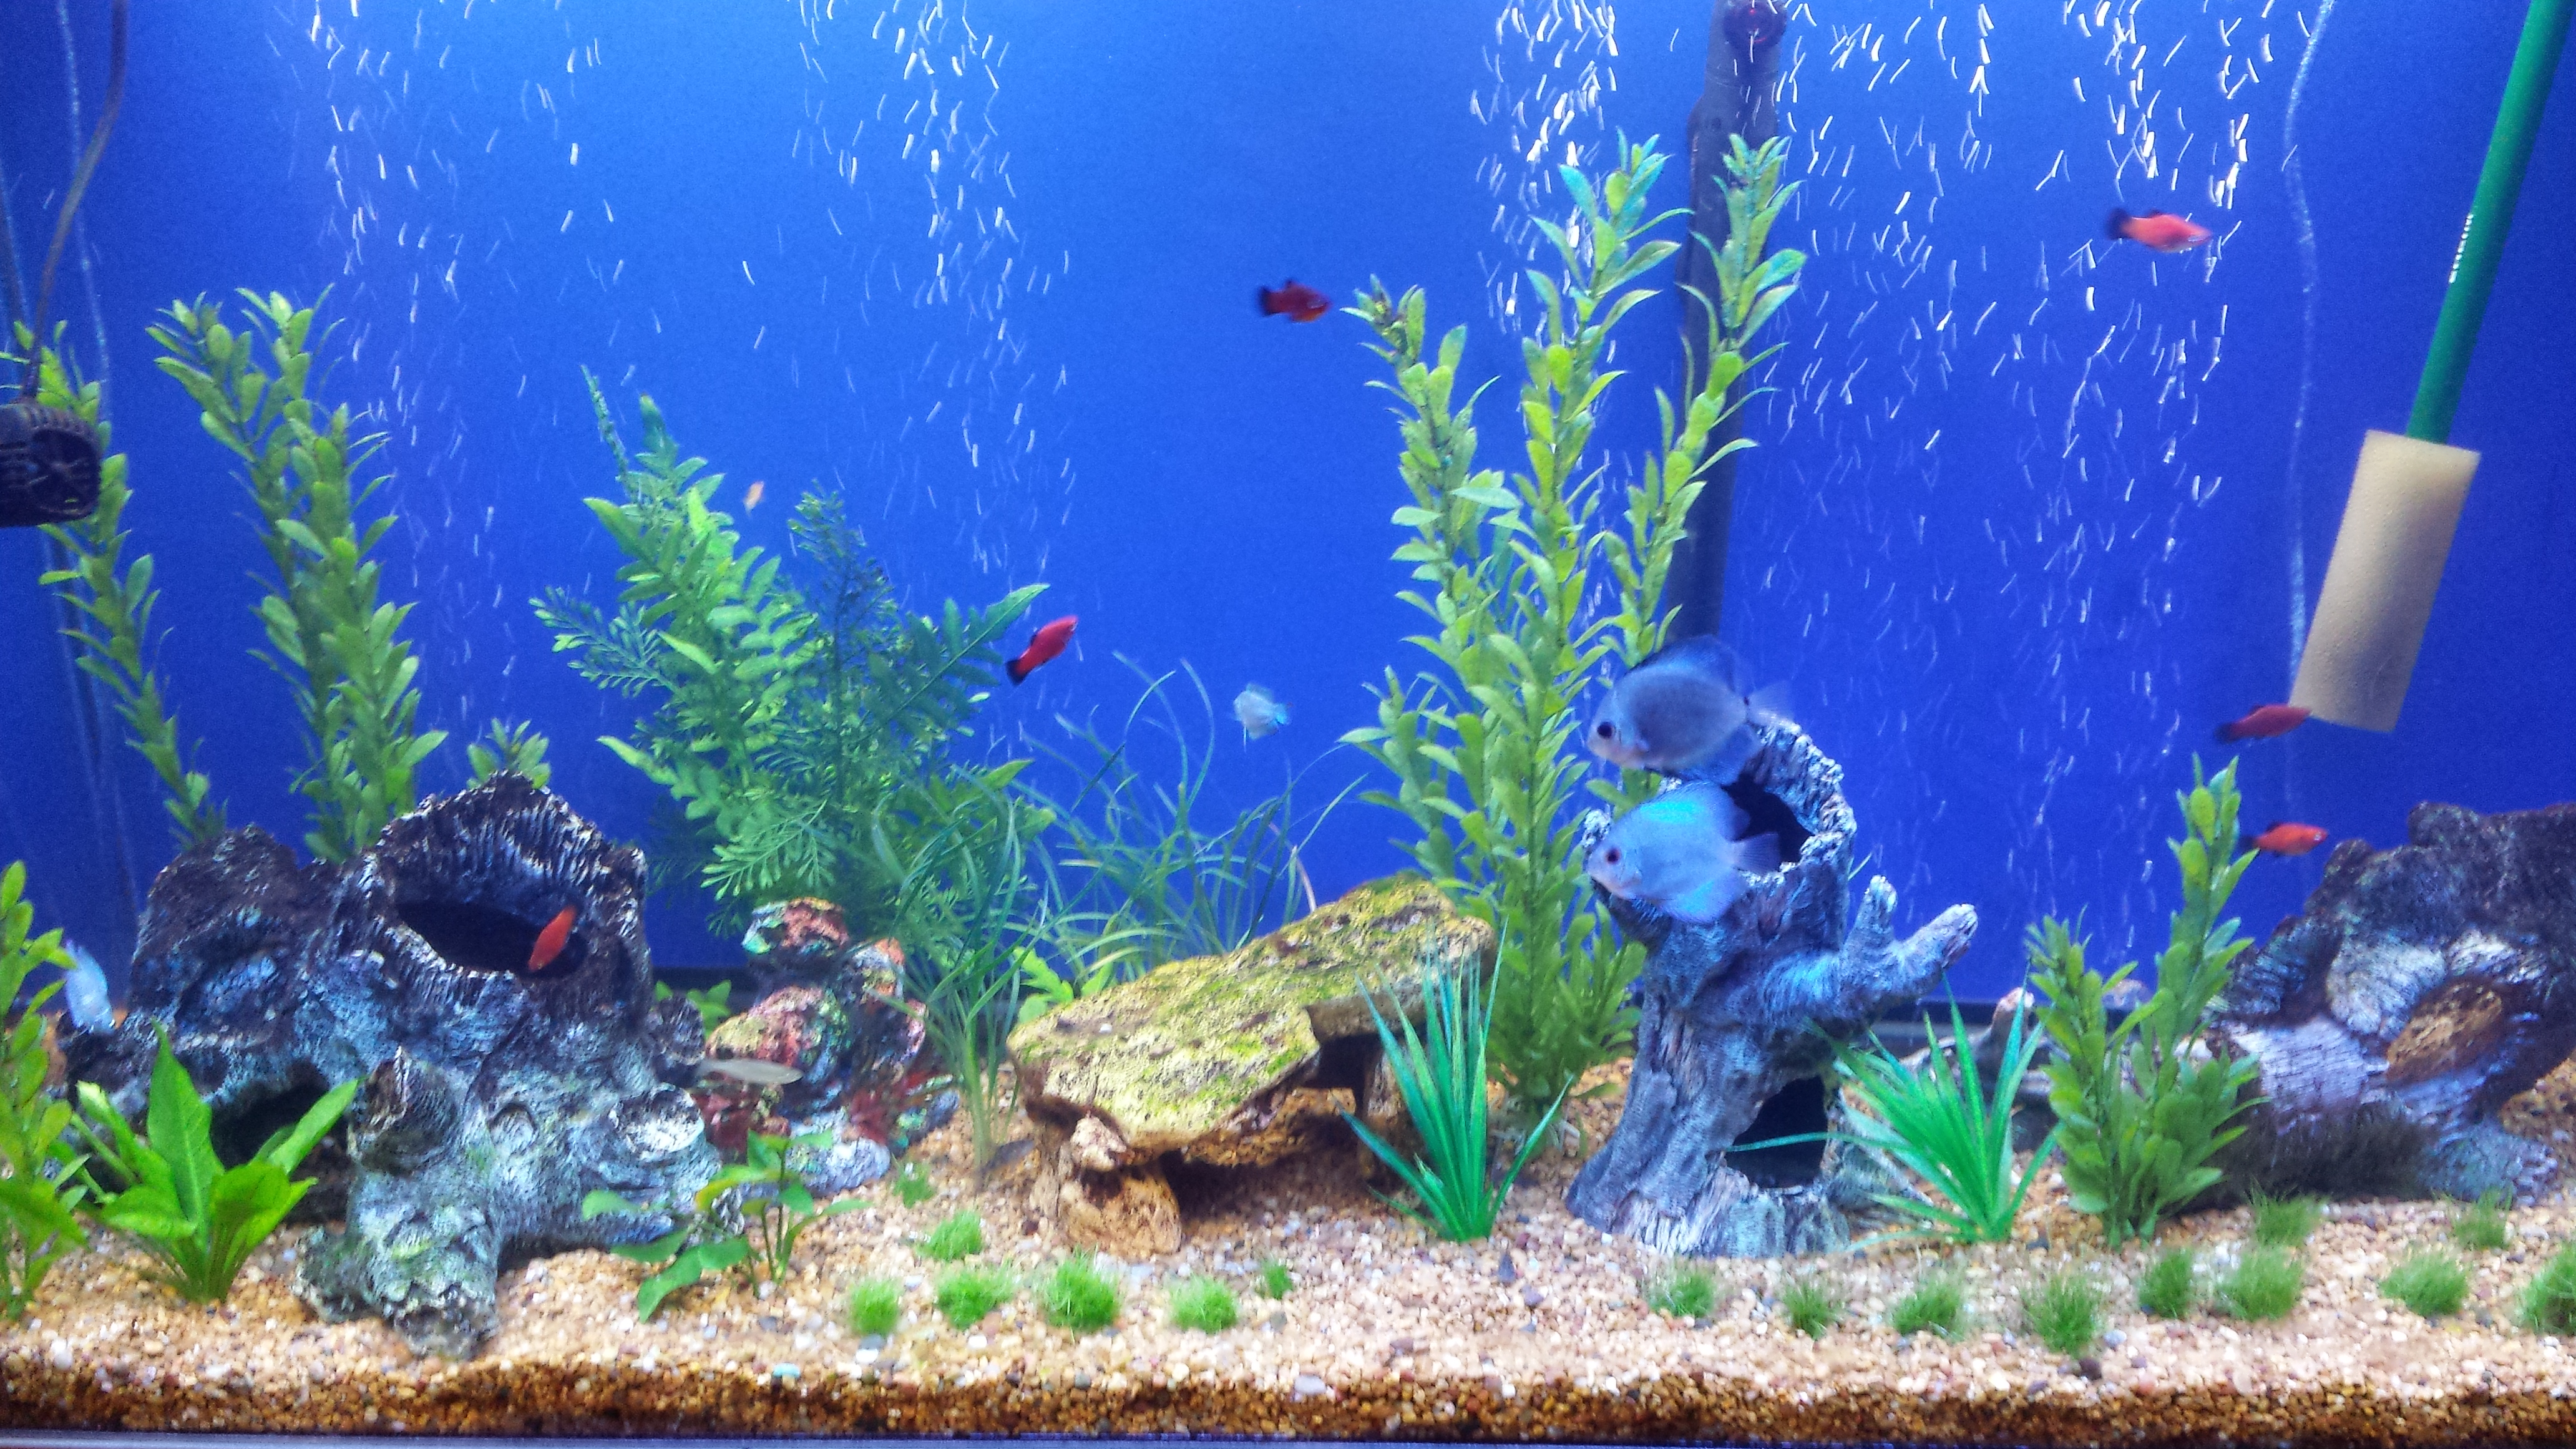 Fish tank wallpaper wallpapersafari for Fish tank background ideas